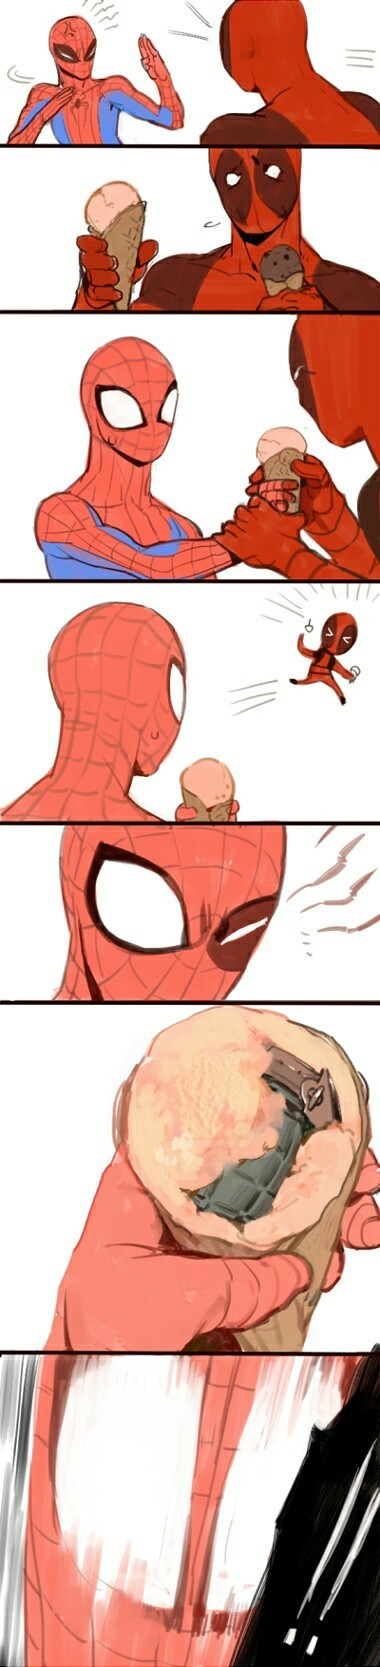 Really, Deadpool? - meme